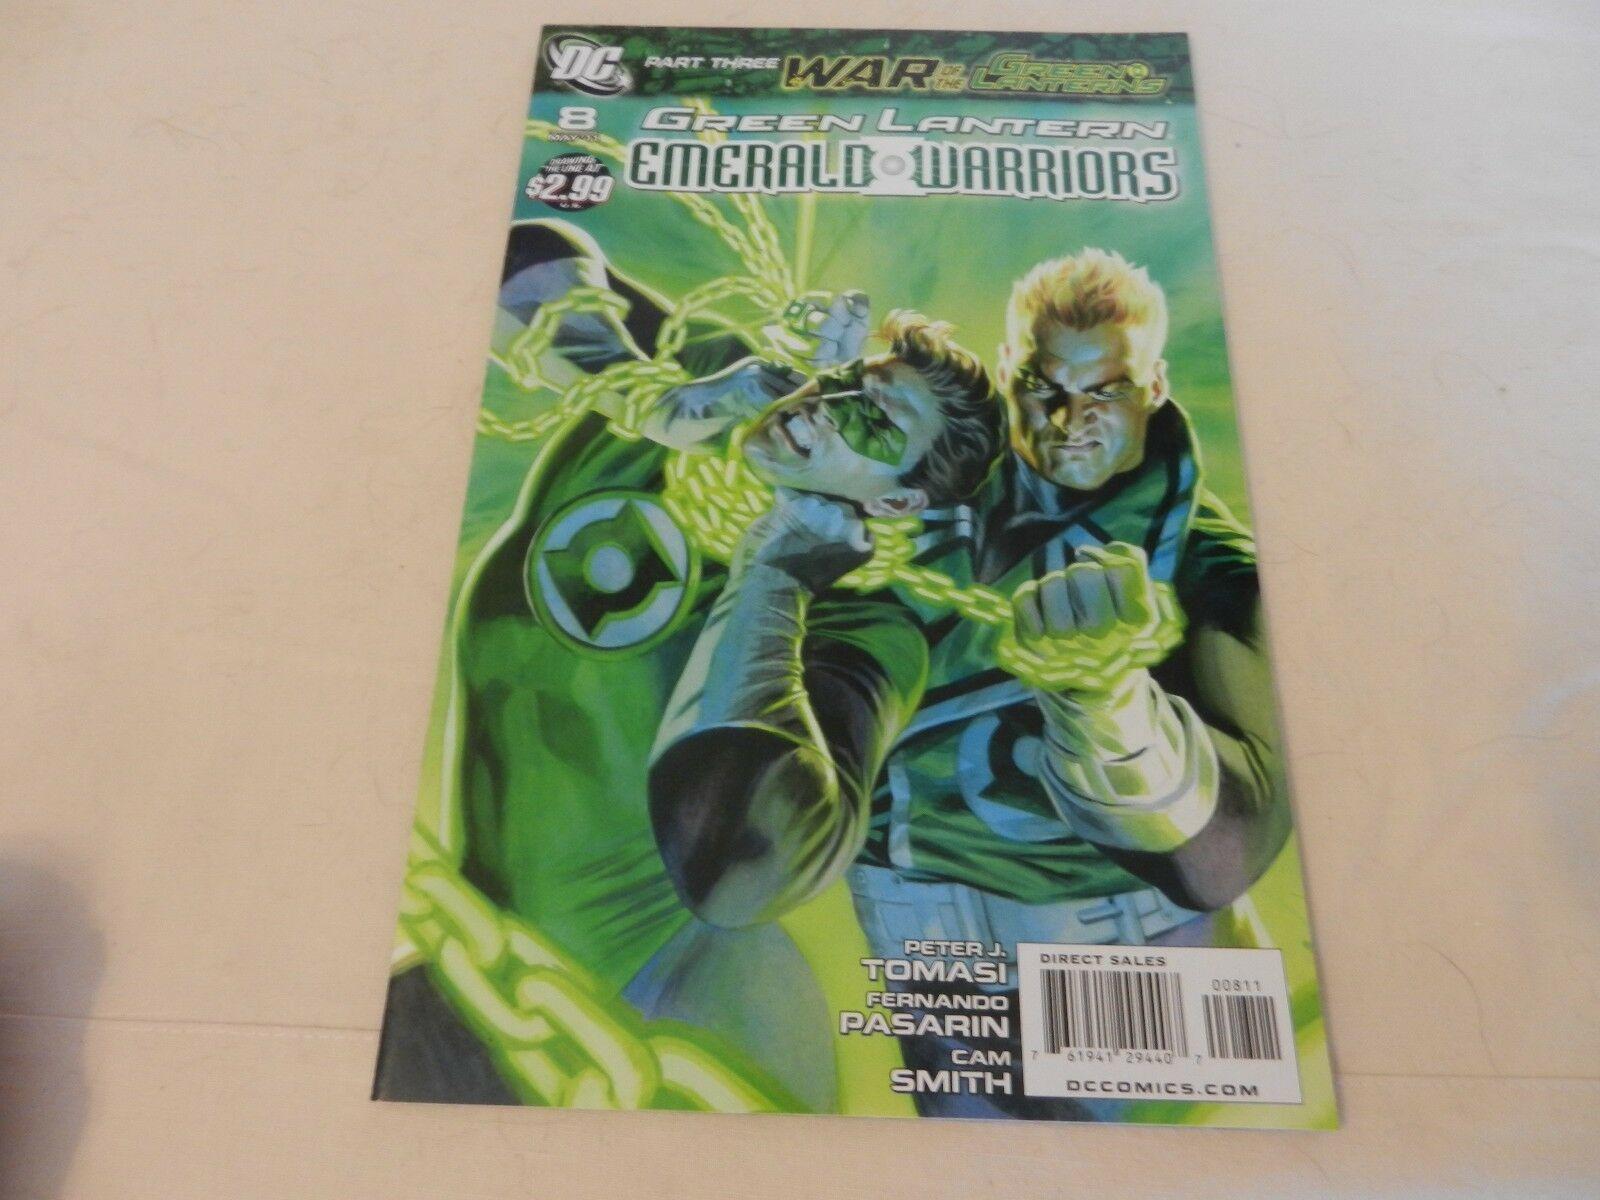 Green Lantern Emerald Warriors War of The Green Lantern DC Comics #8 May 2011